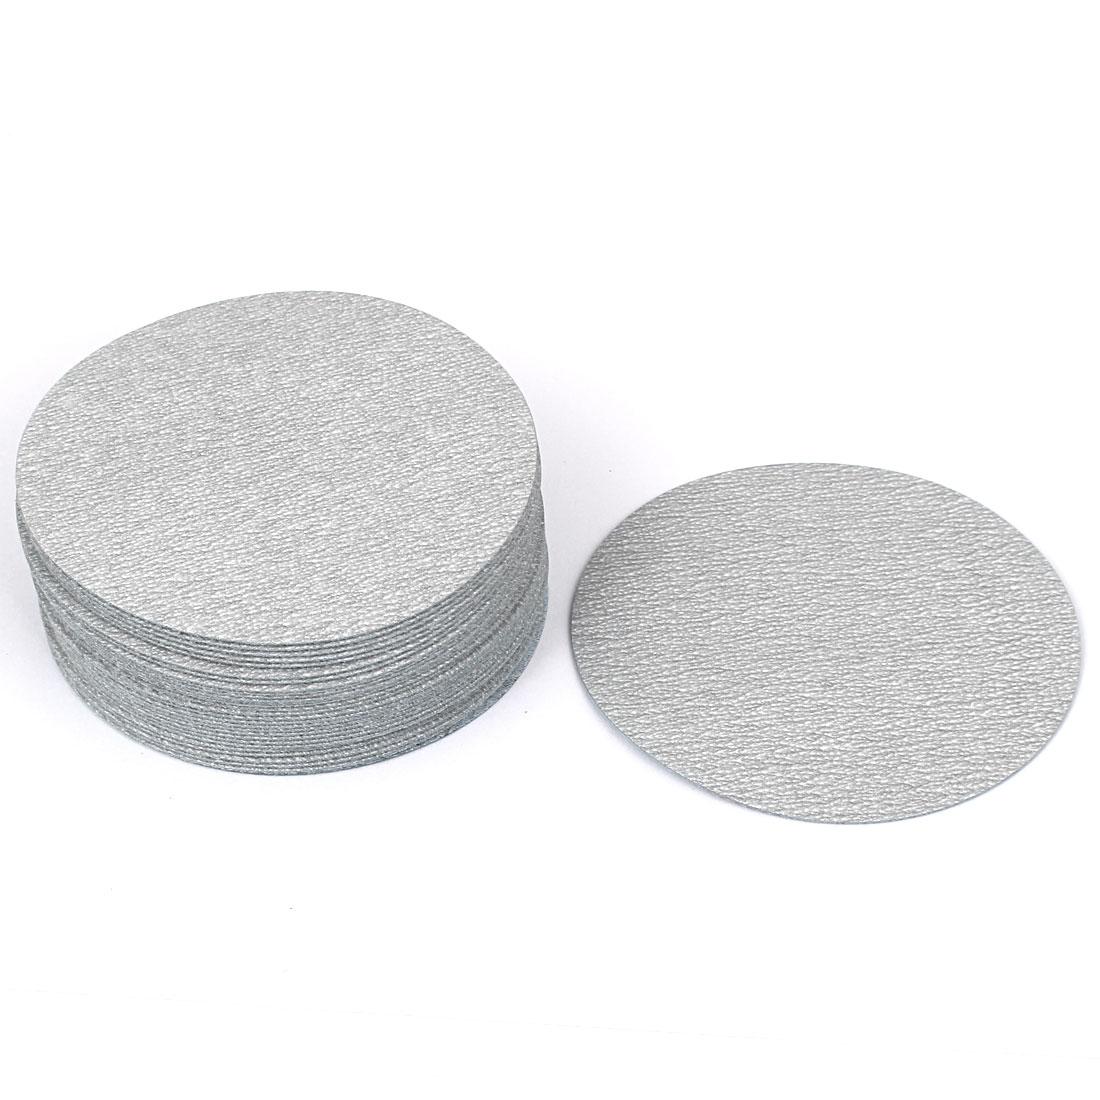 30Pcs Sanding Disc Sandpapers 4